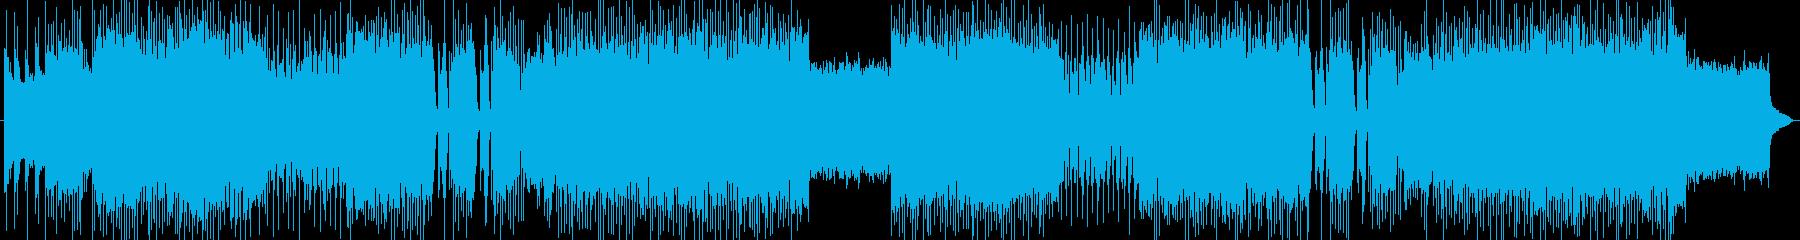 「HR/HM」「DARK」BGM236の再生済みの波形